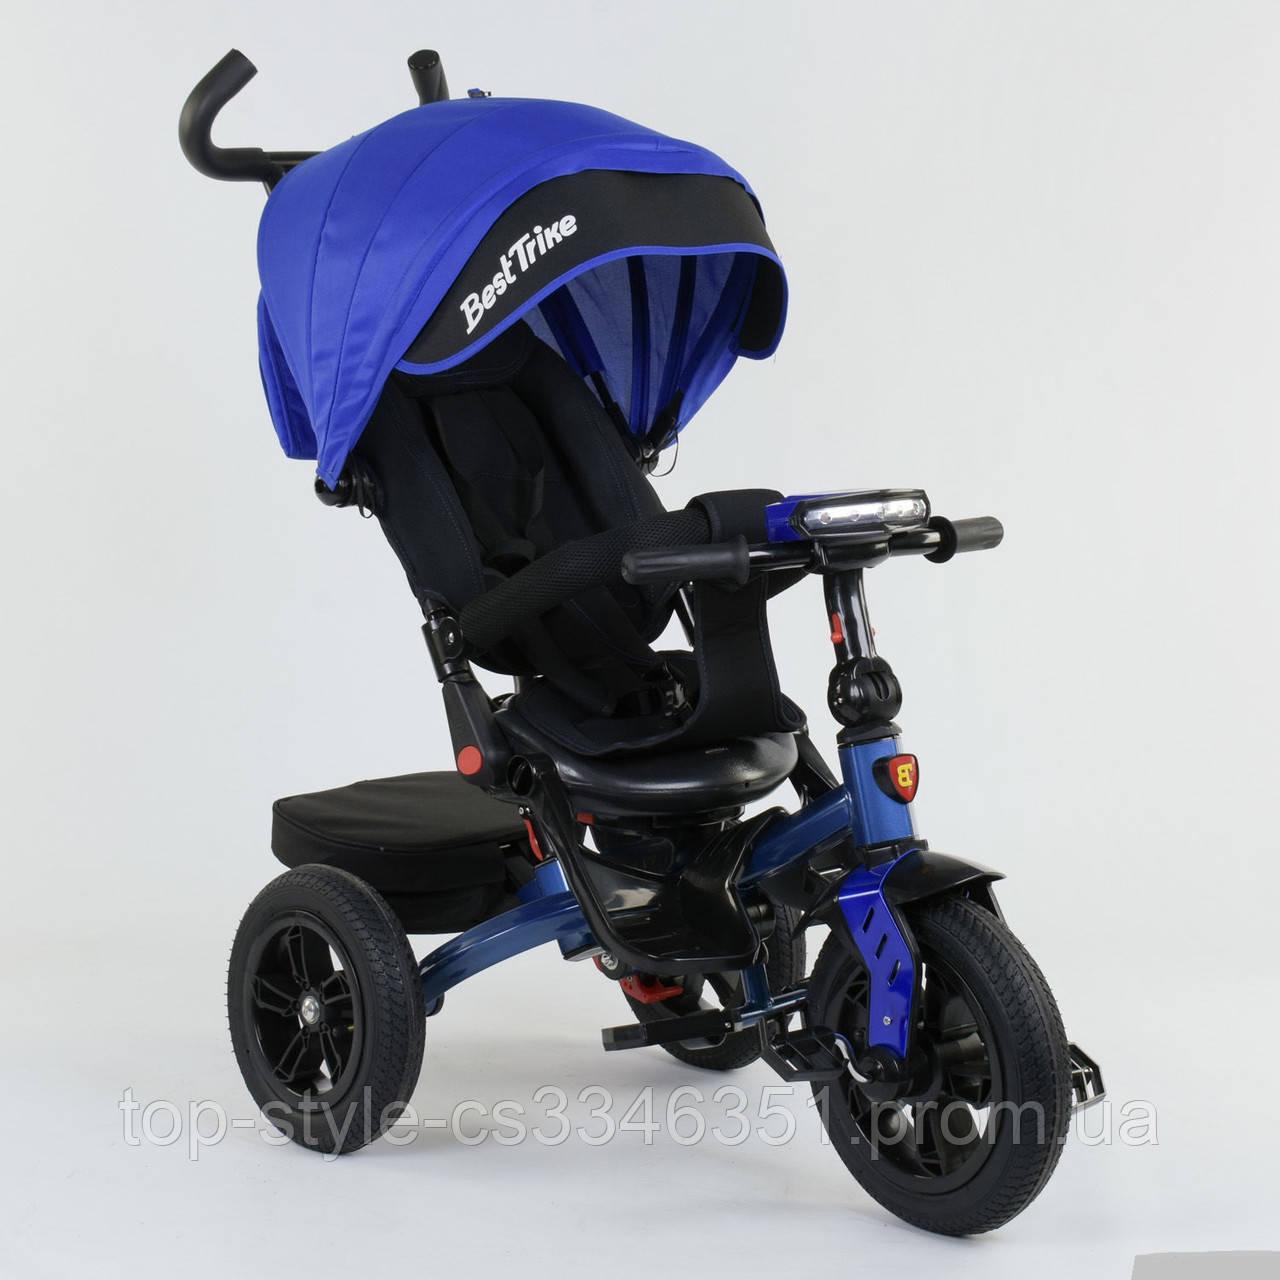 Велосипед трехколесный Best Trike 9500 - 7820 Синий